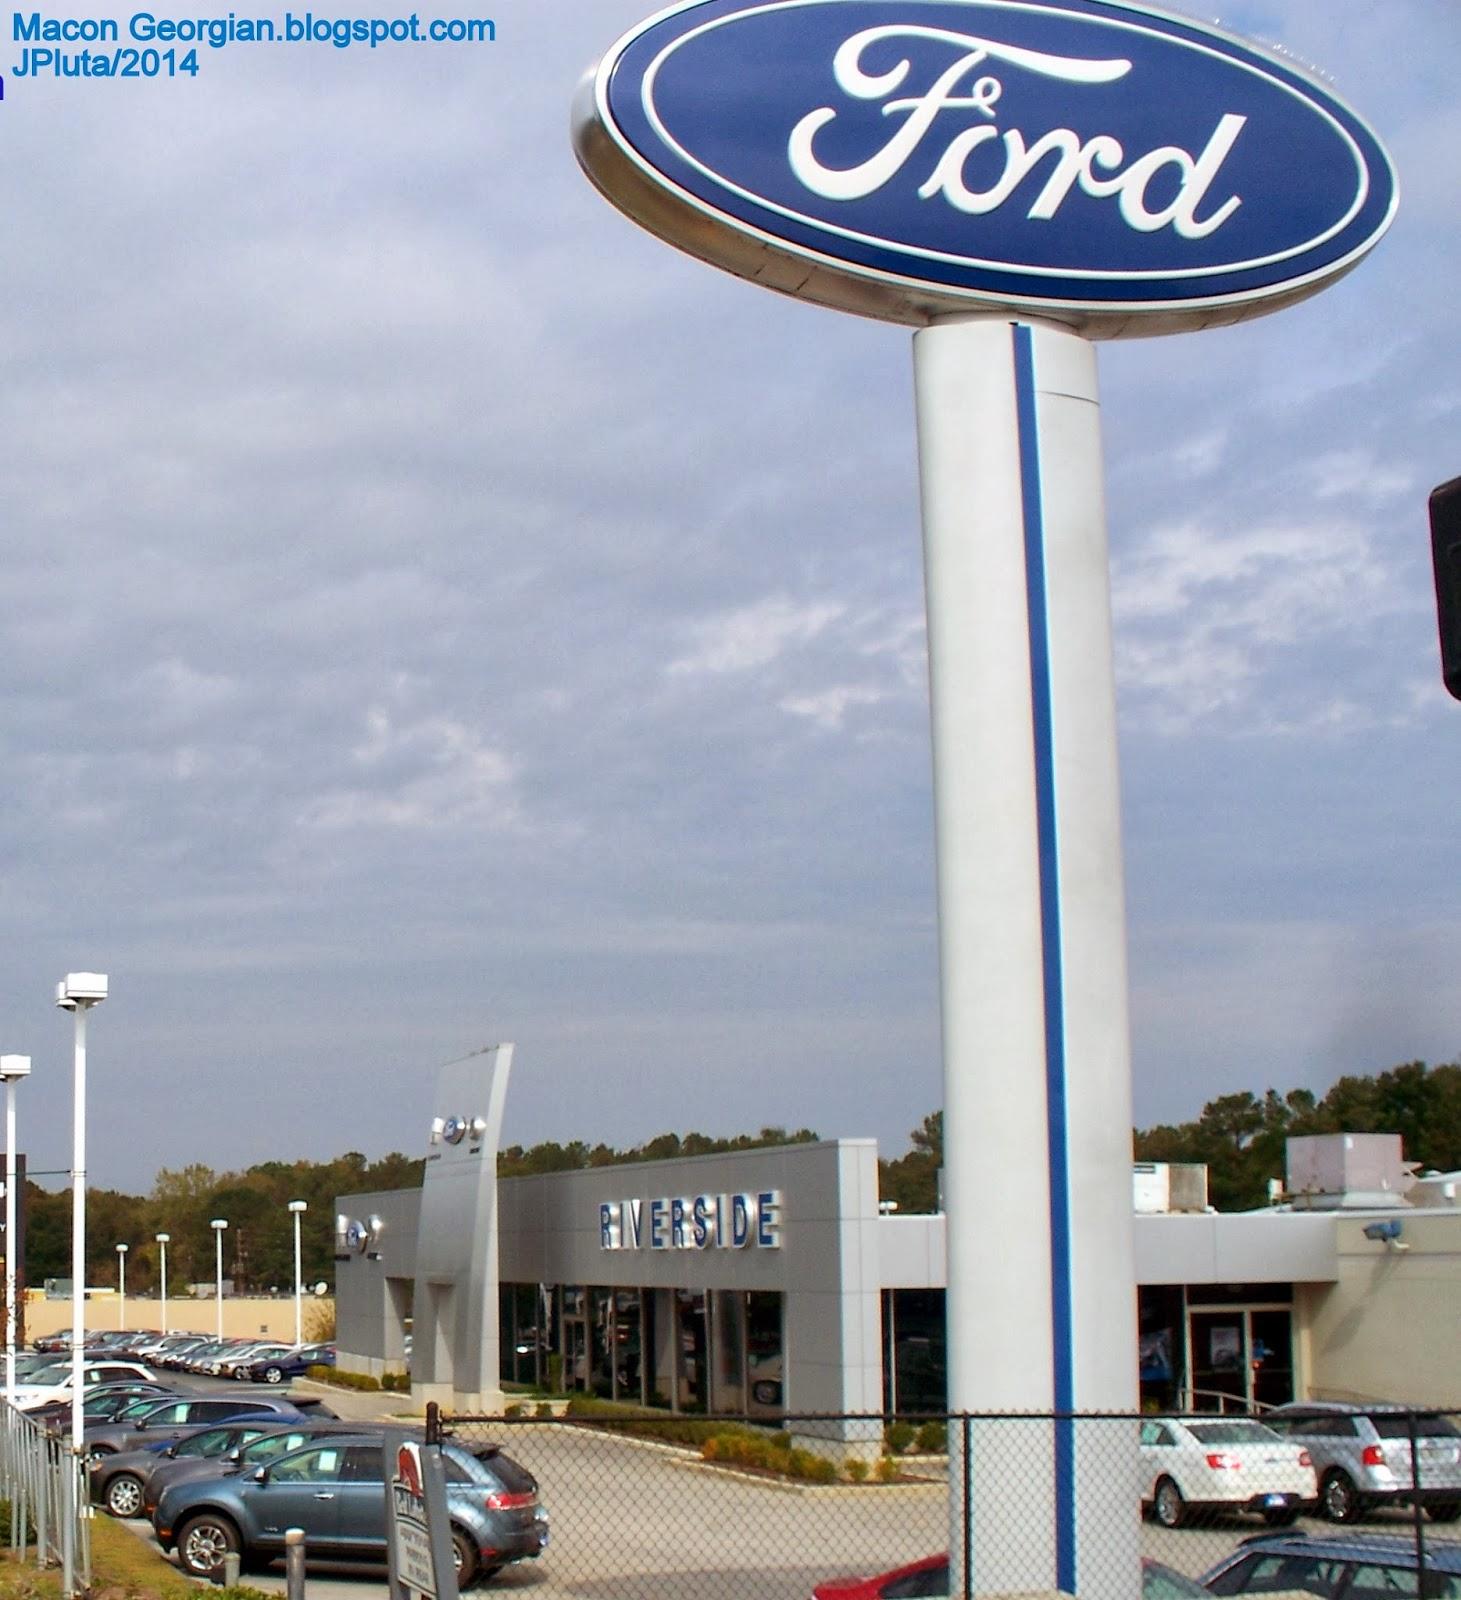 Riverside Ford Macon >> MACON GEORGIA Attorney College Restaurant Dr.Hospital ...